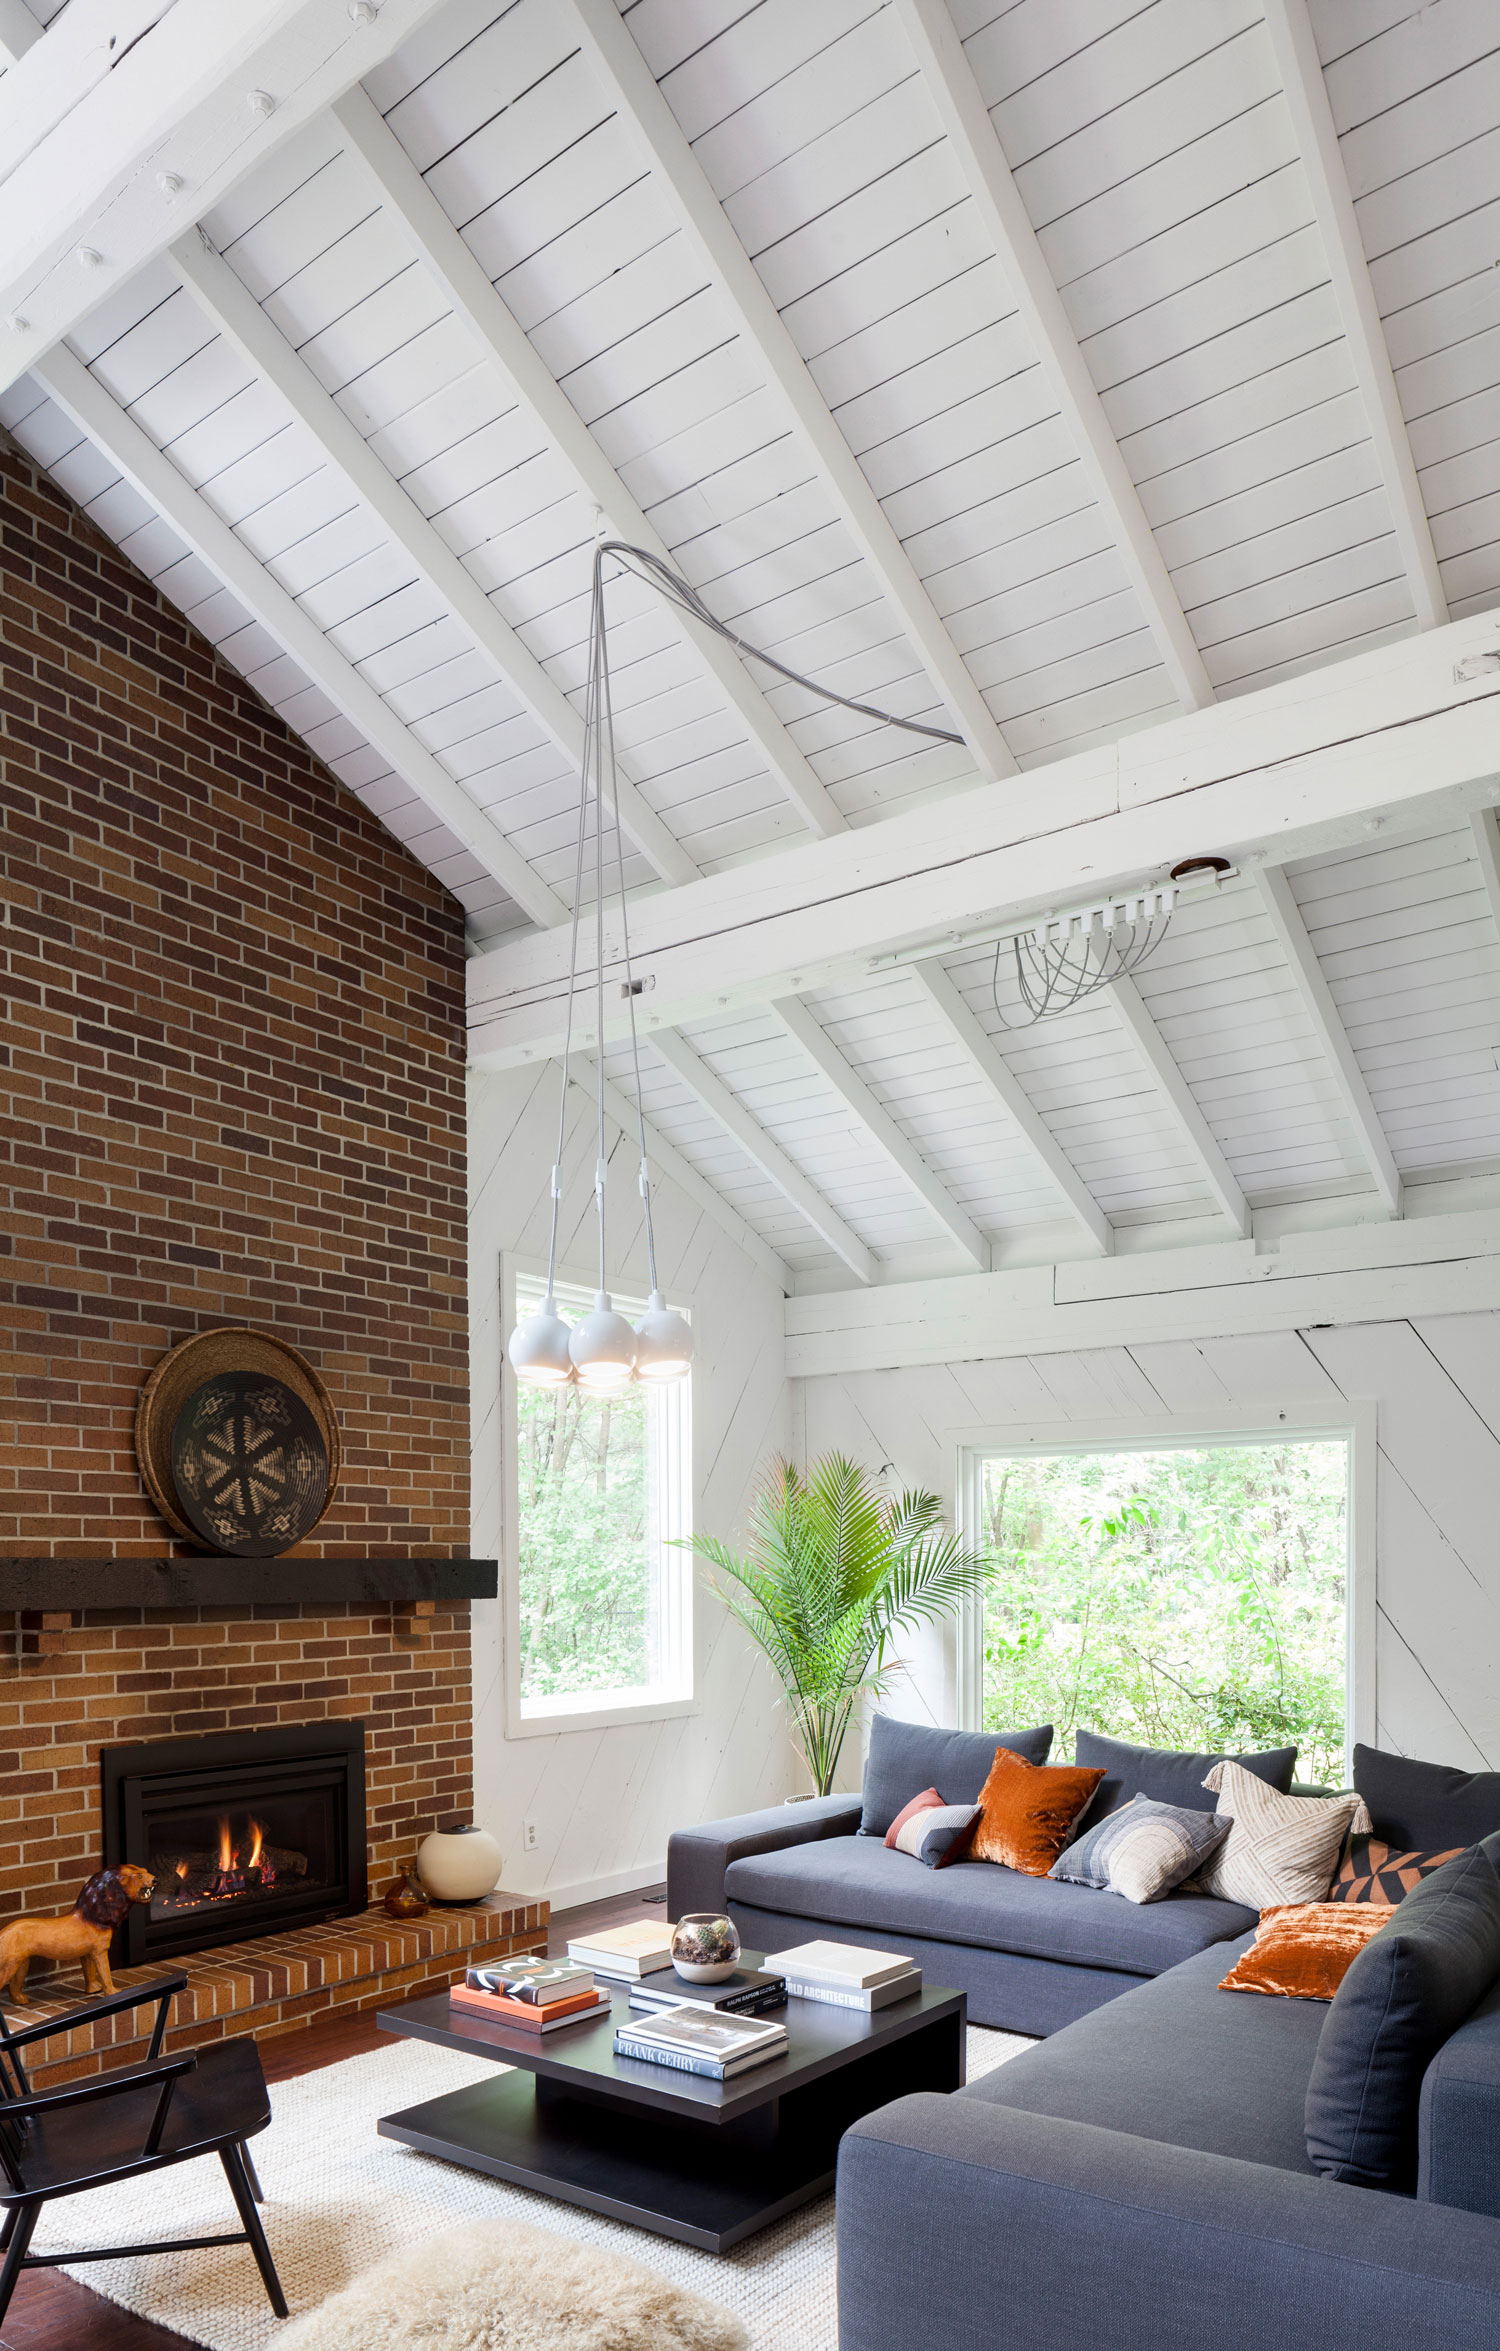 minneapolis-st-paul-home-decor-interior-designer-interior-stylist-interior-design-10.jpg